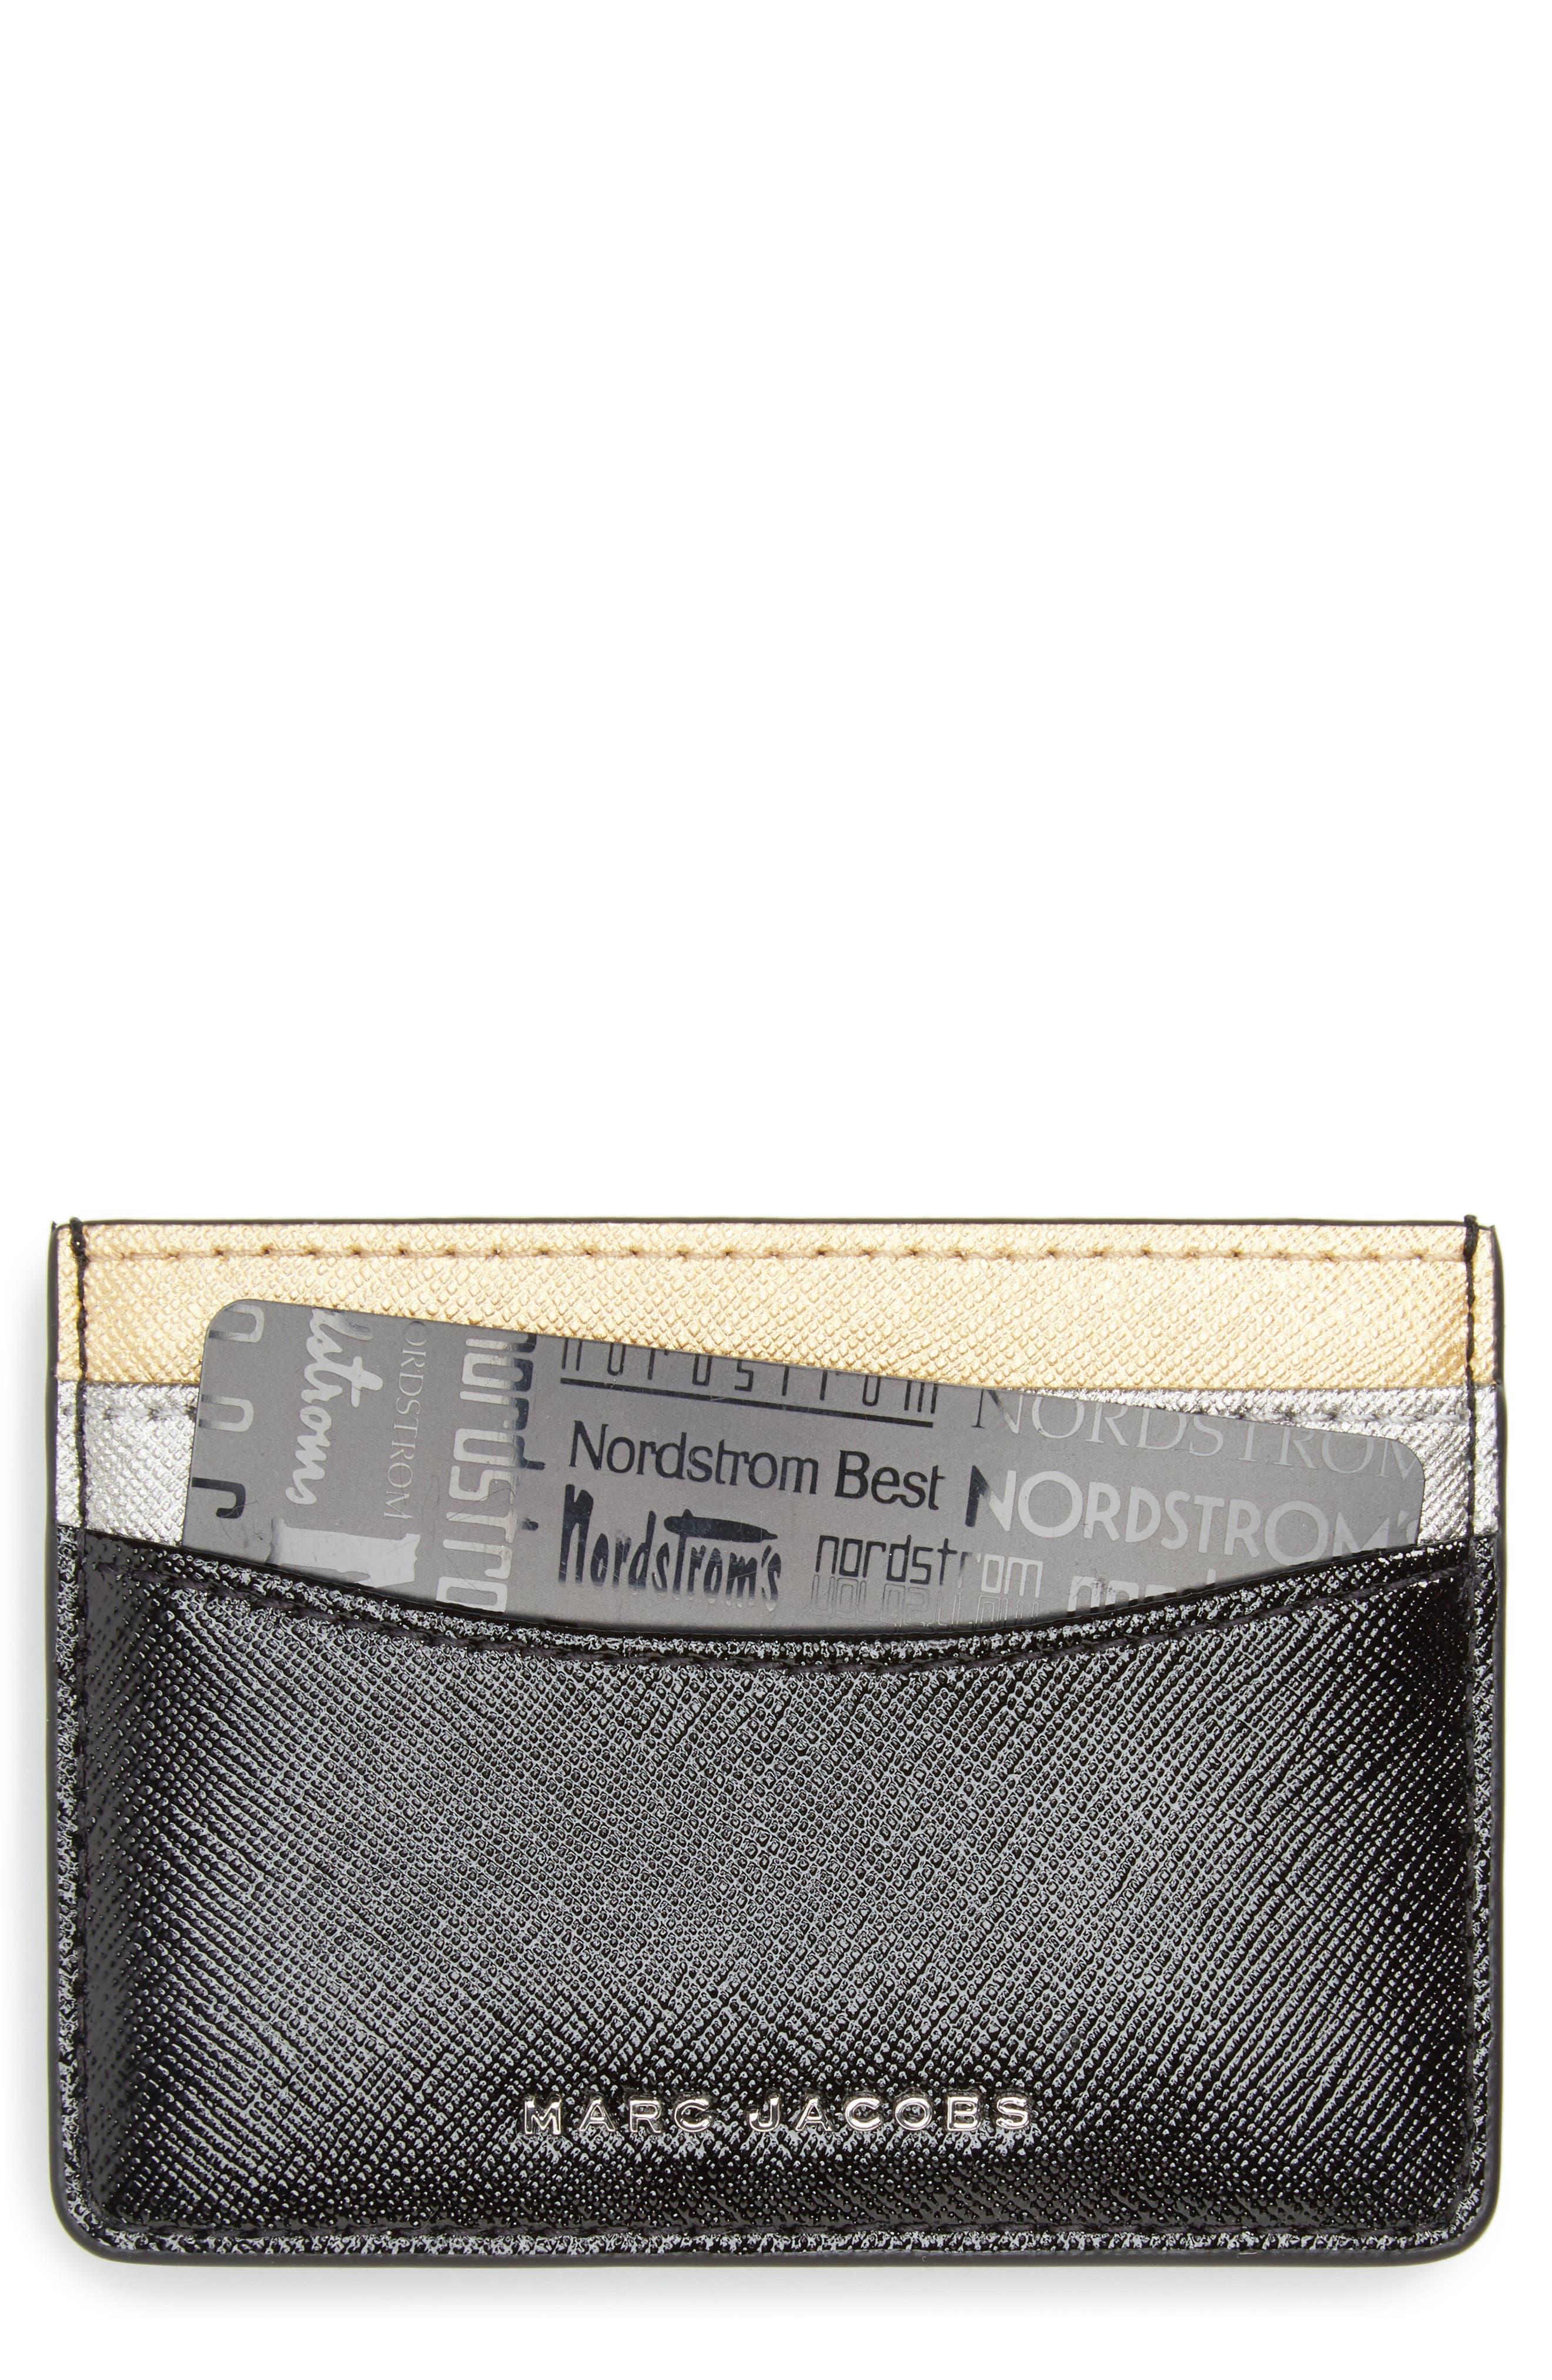 MARC JACOBS Tricolor Saffiano Leather Card Case